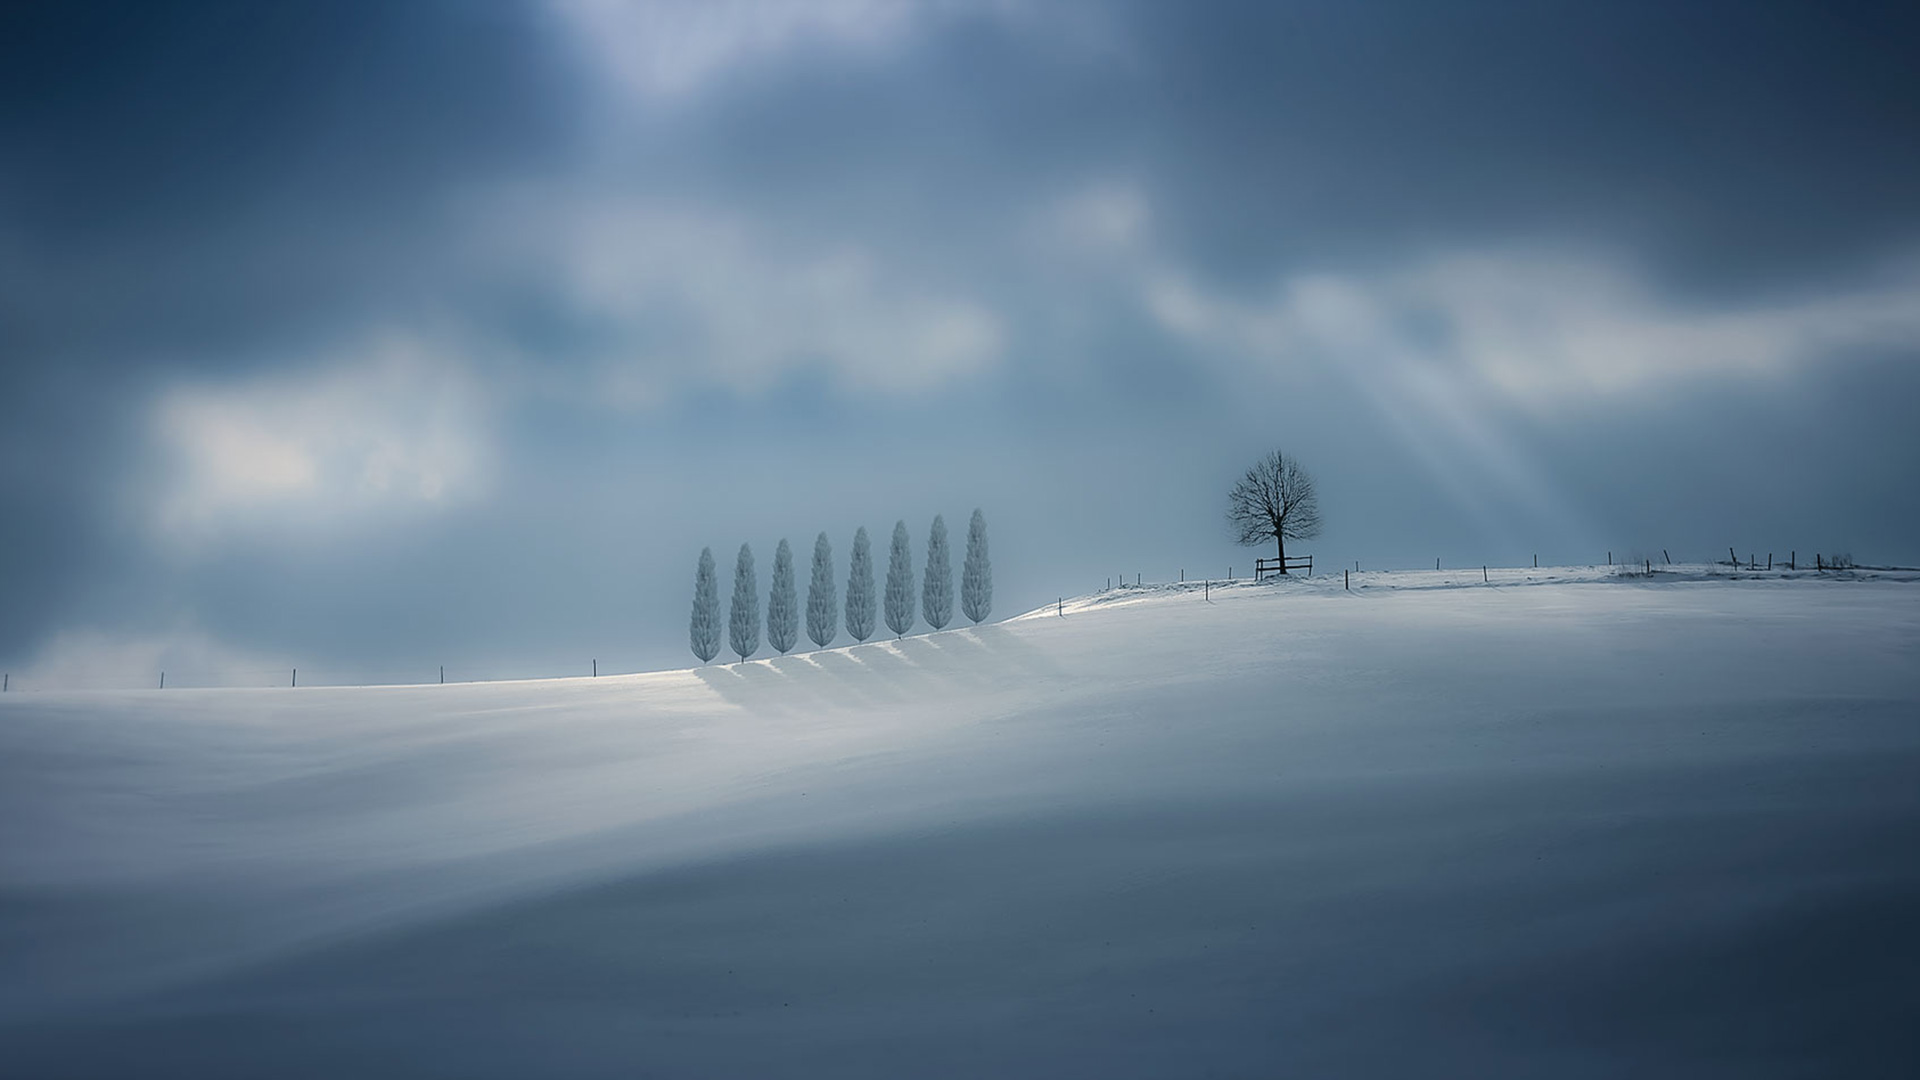 Toskana winter 2014...